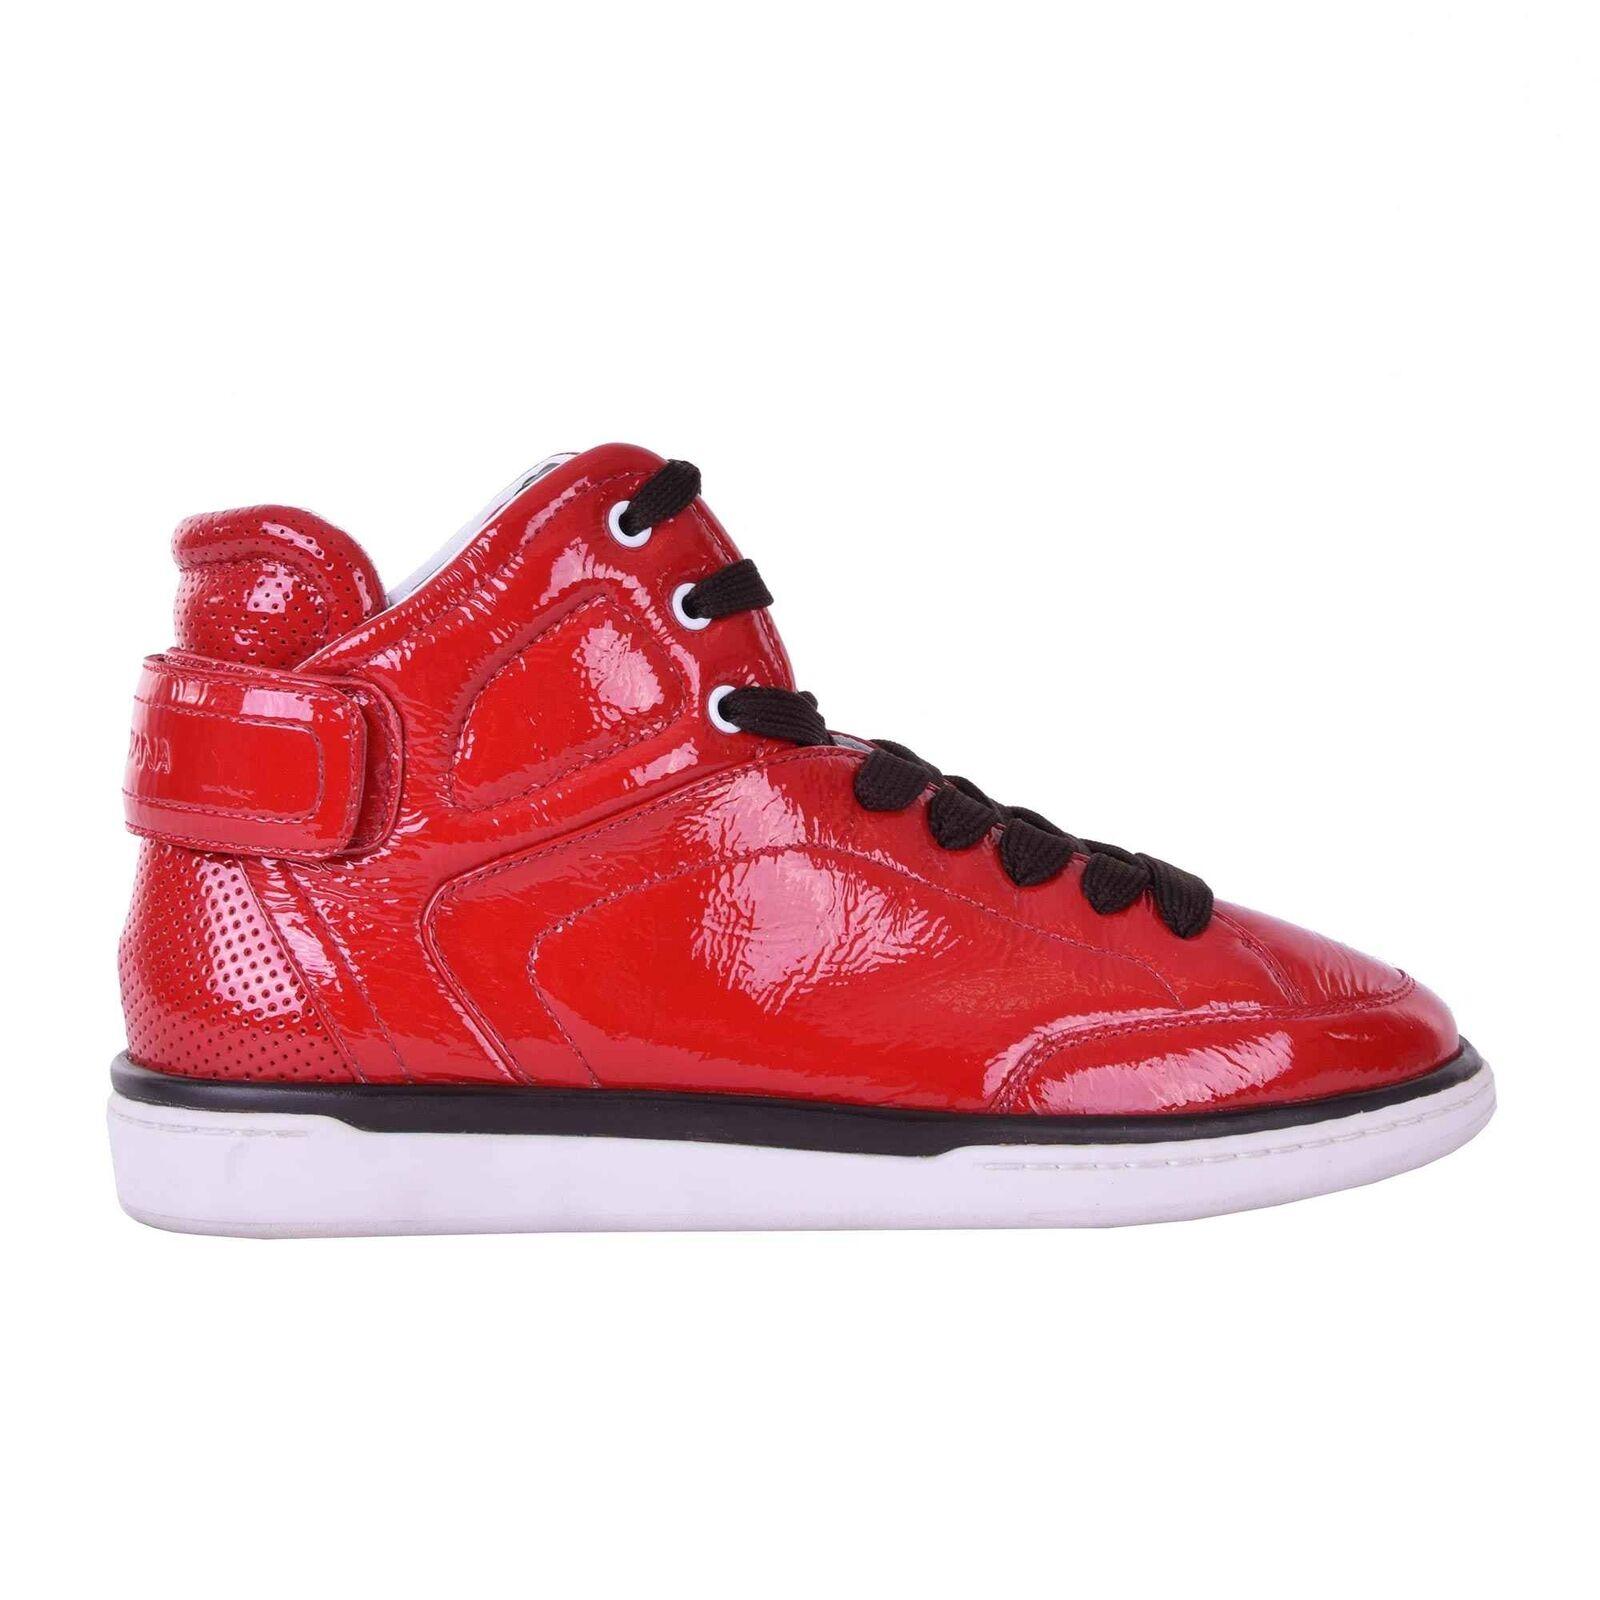 DOLCE & GABBANA High-Top Lackleder Sneakers Sneaker Schuhe USLER Rot 05922